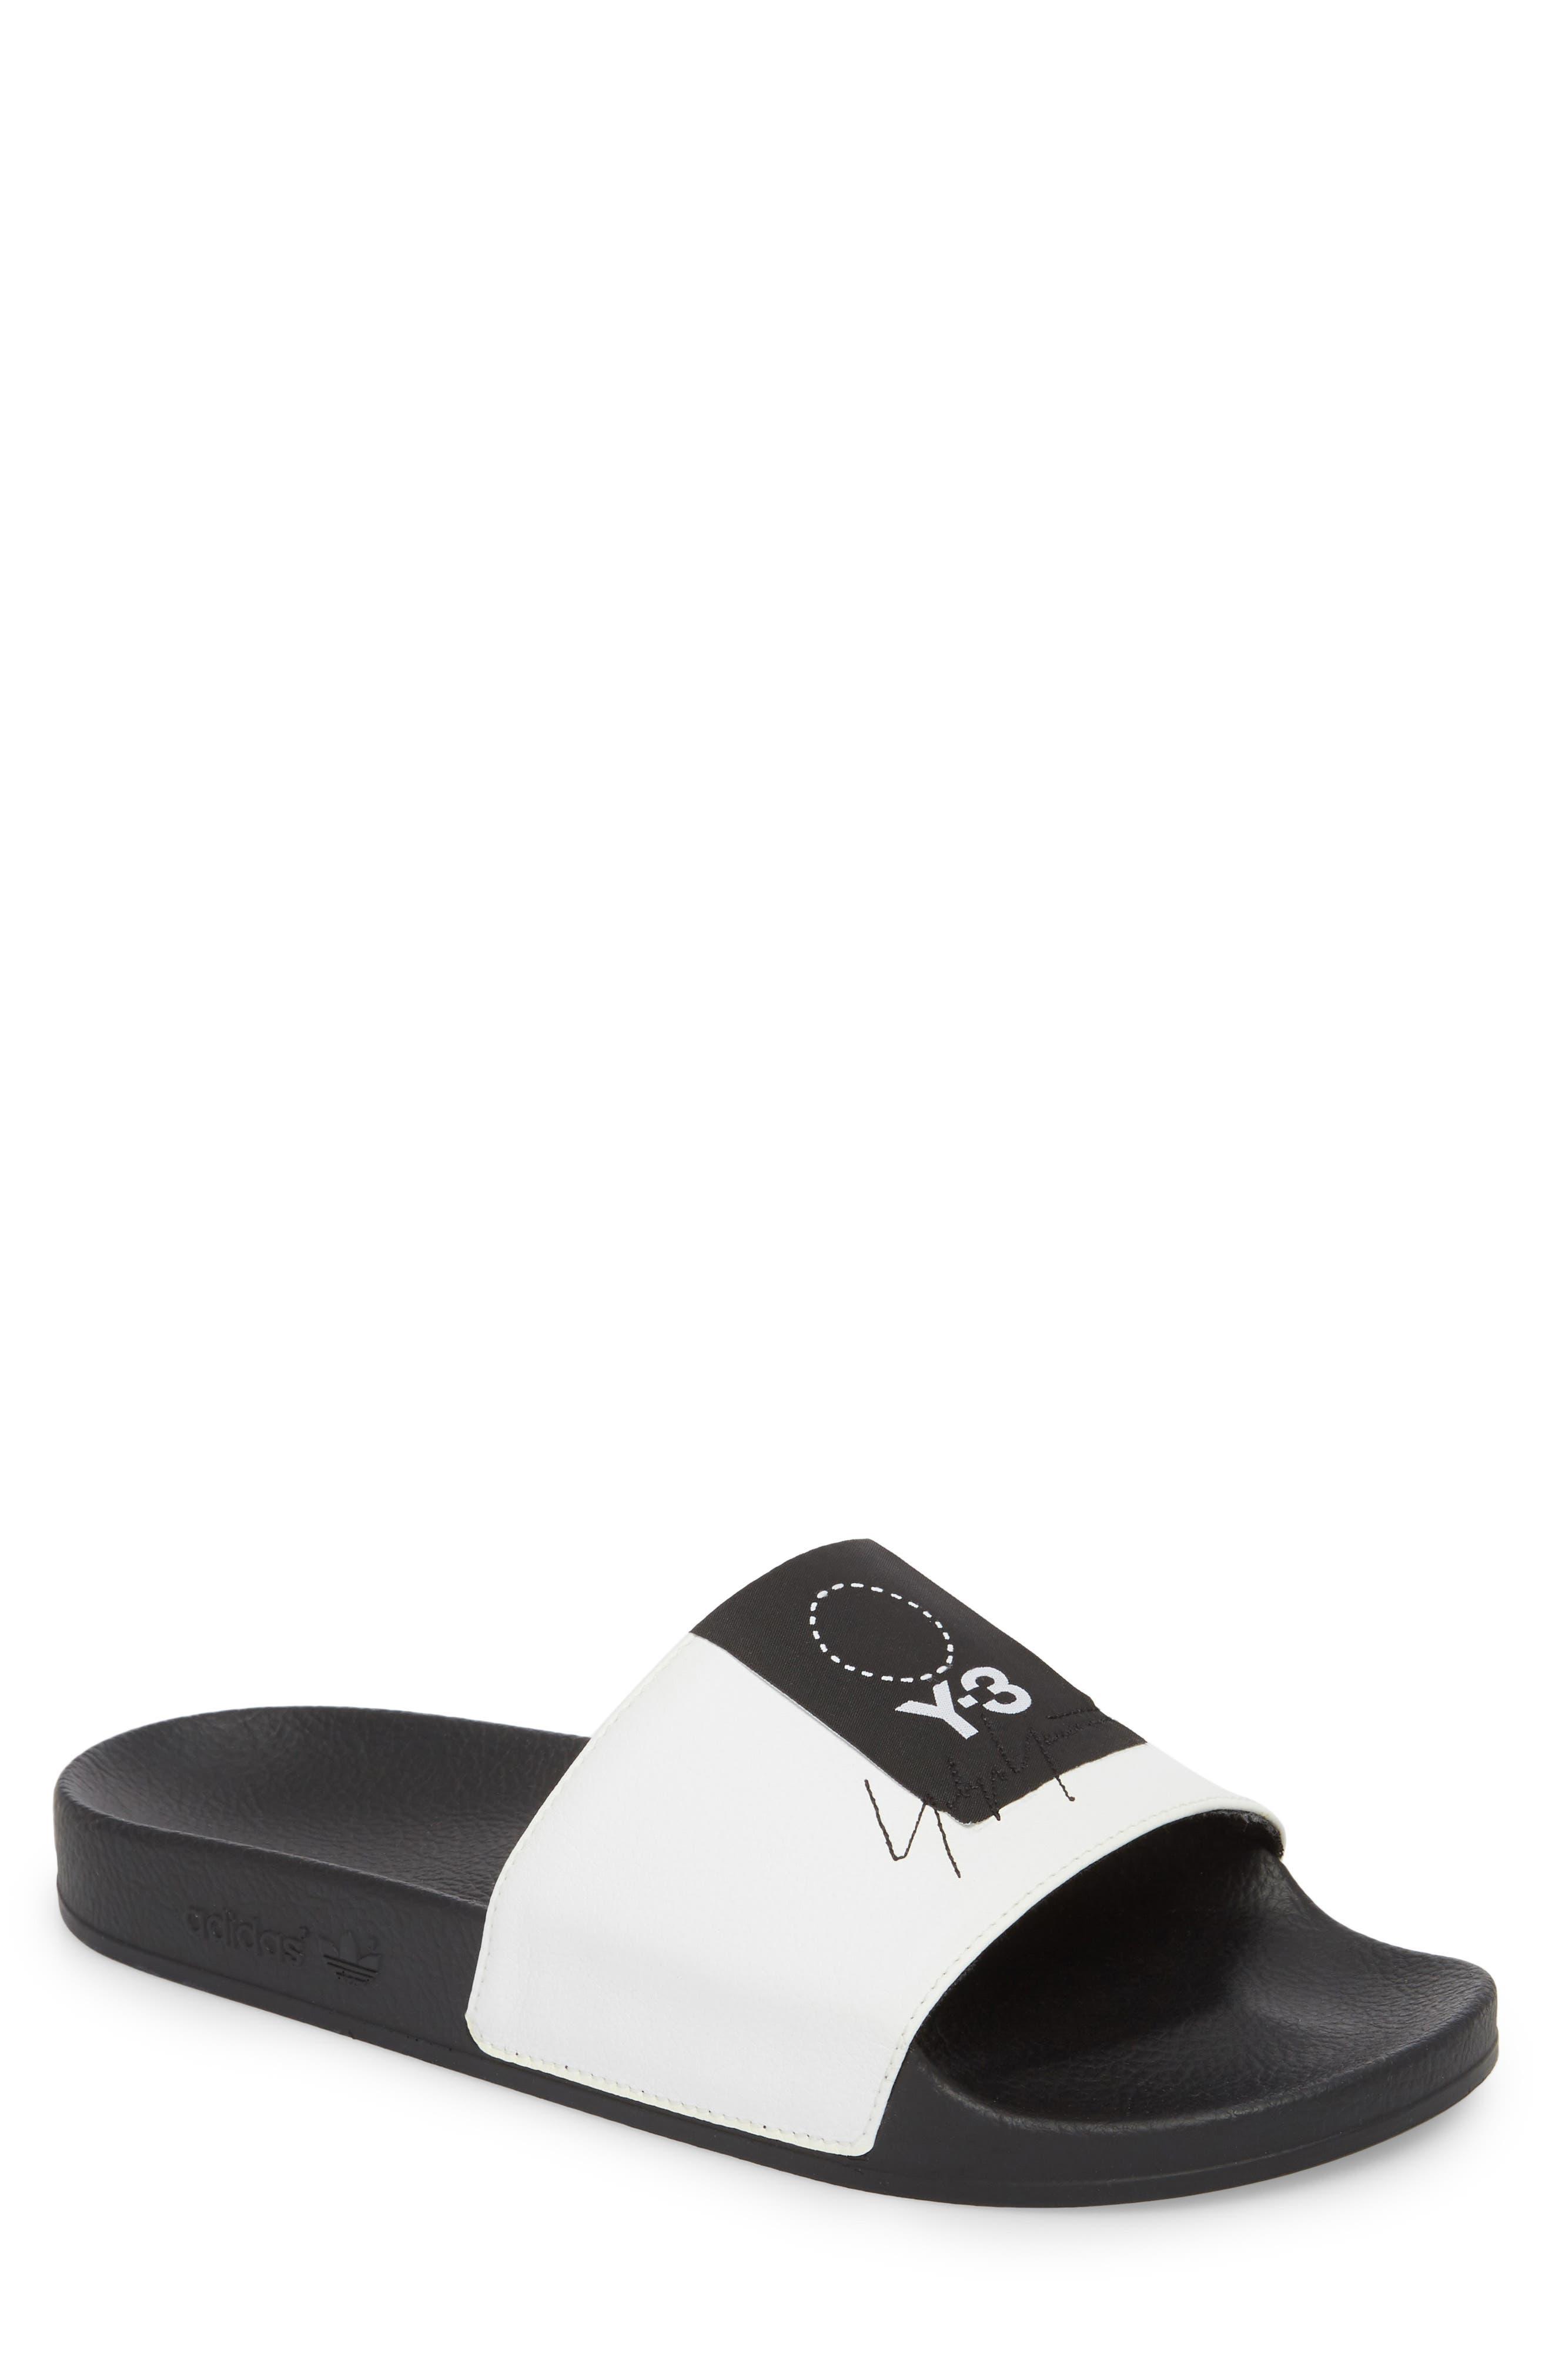 Adilette Slide Sandal,                             Main thumbnail 1, color,                             WHITE/ BLACK